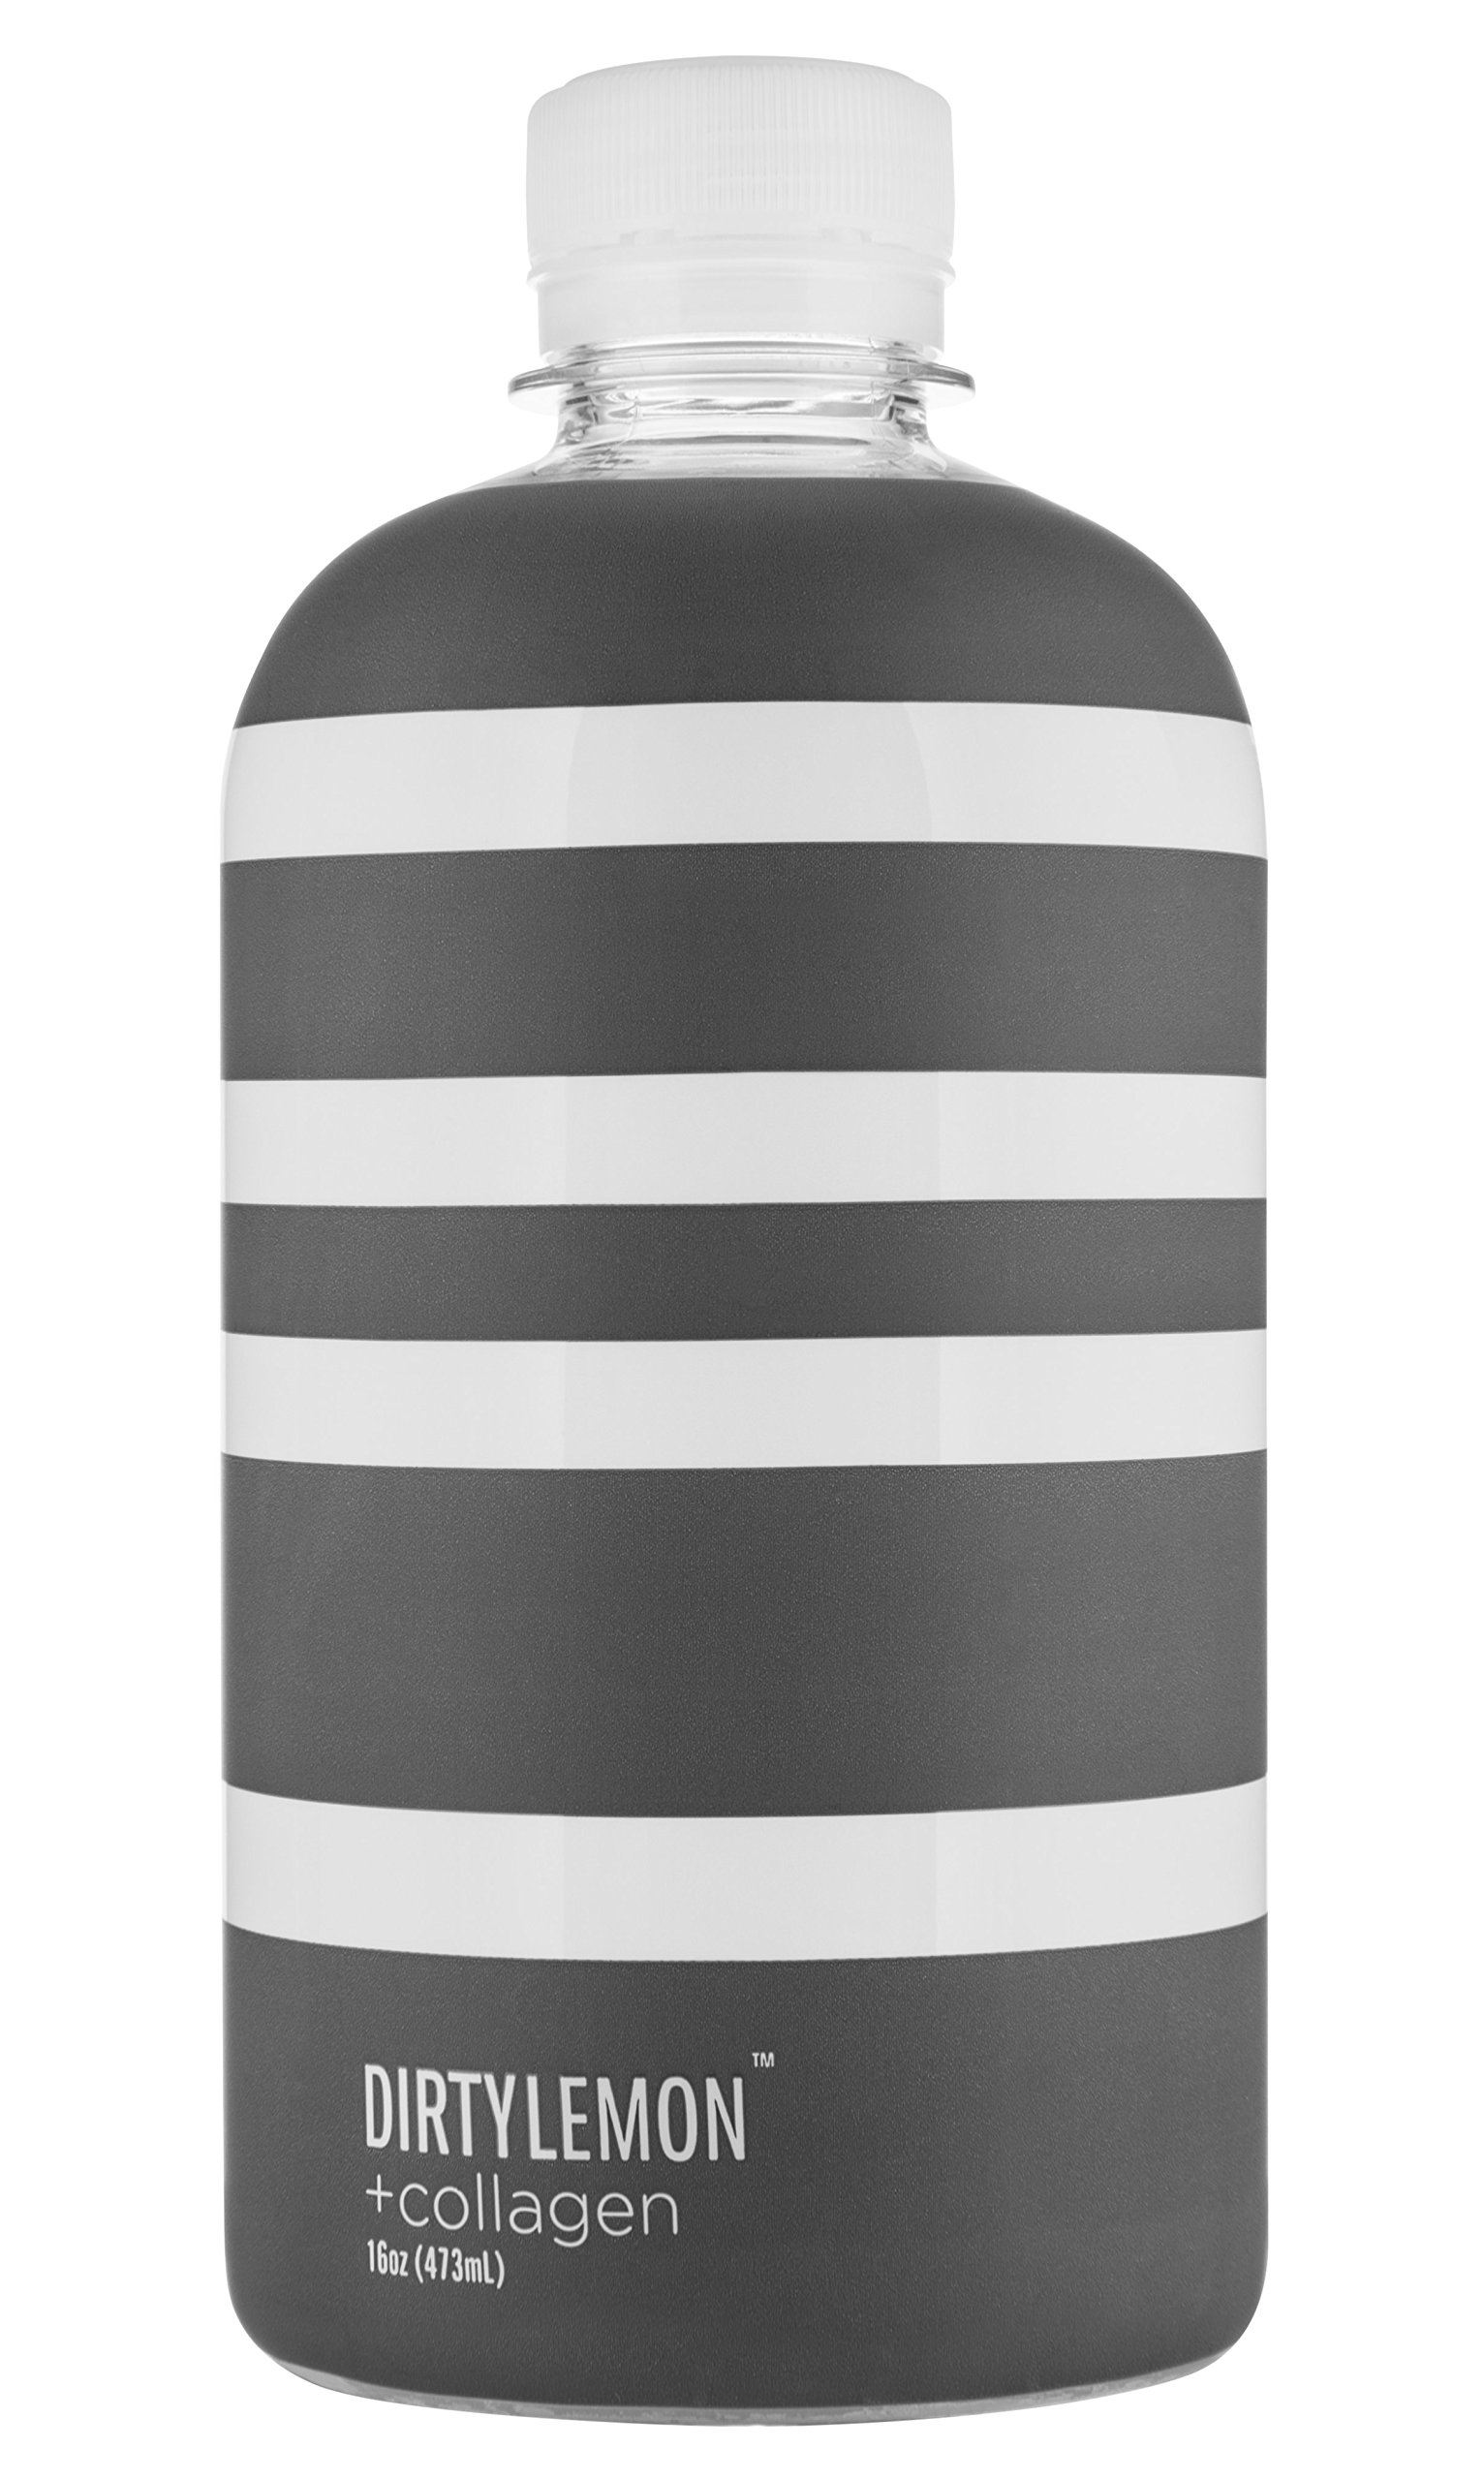 DIRTY LEMON +collagen Beauty Elixir, 16 oz Bottles, (Case of 6)